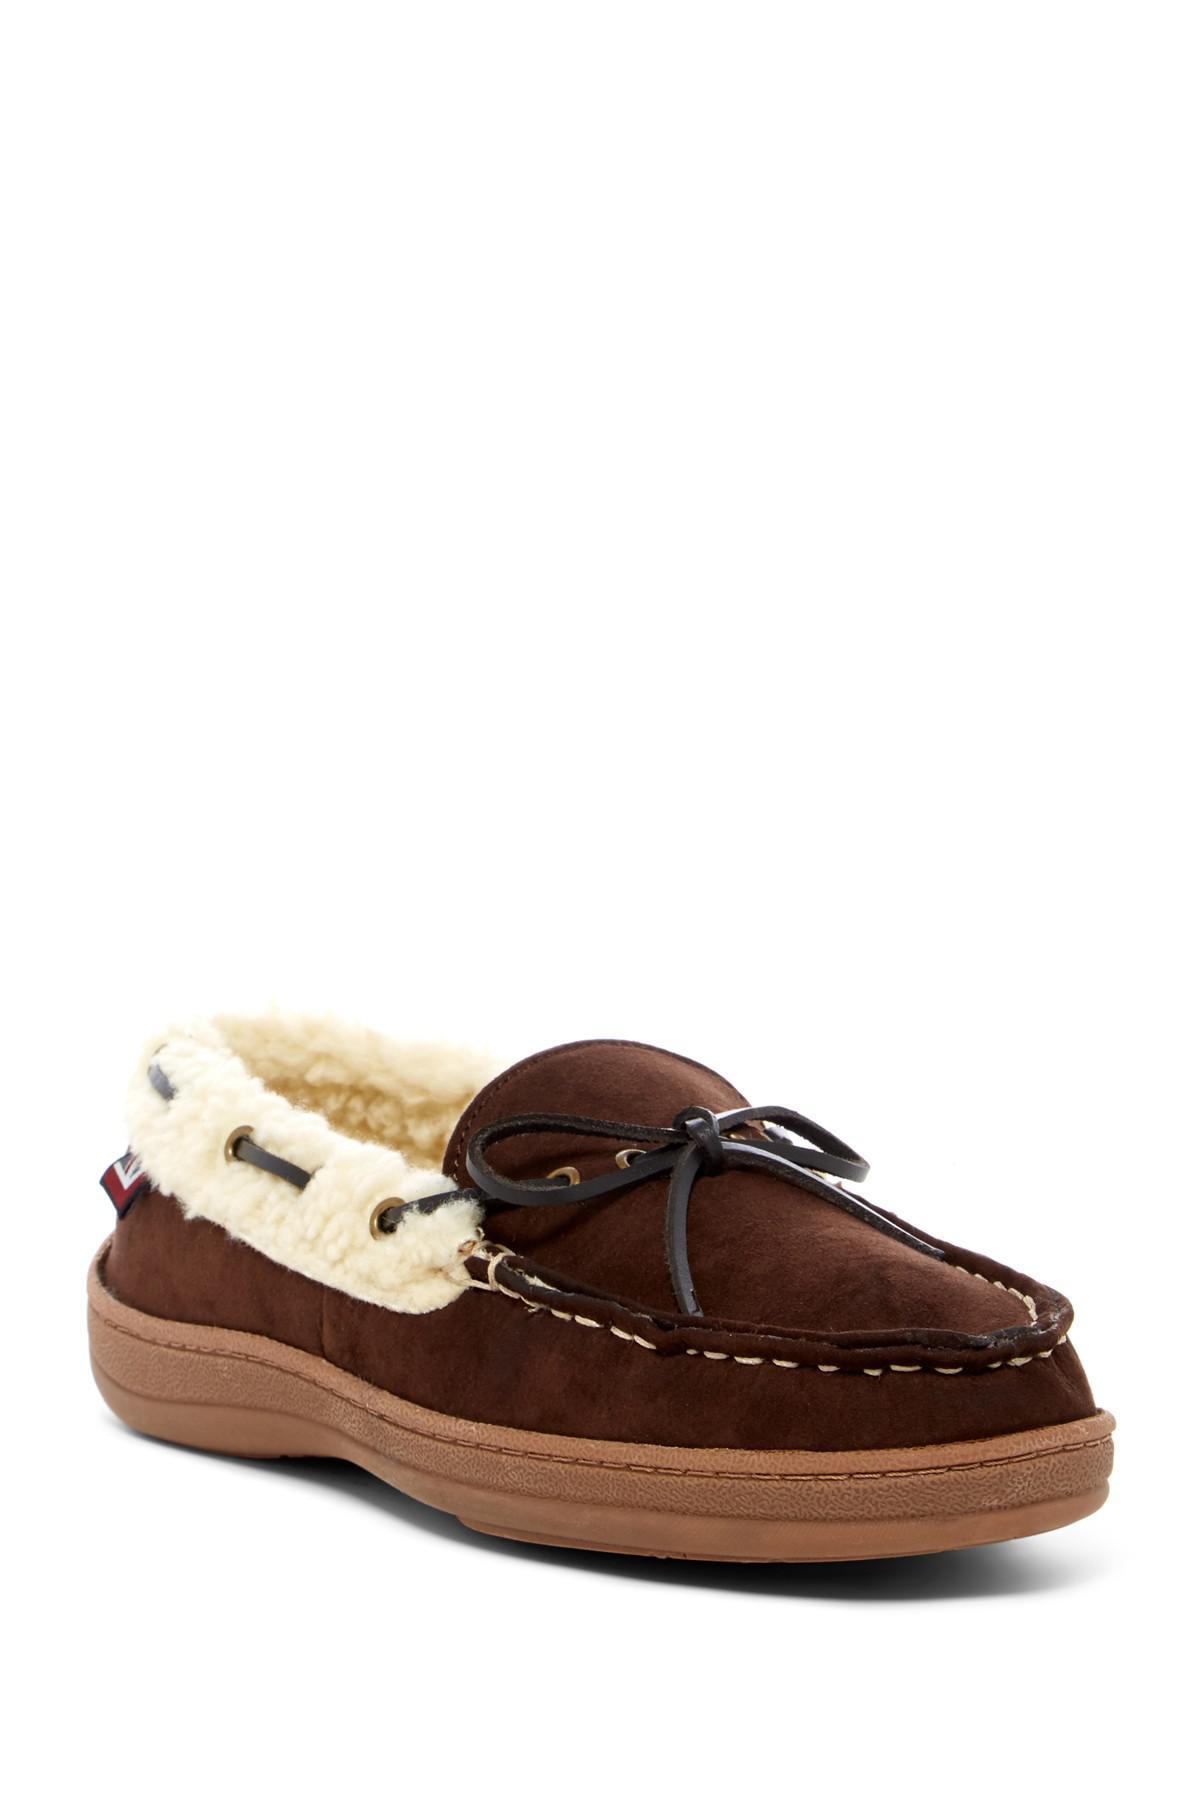 Ben Sherman Milton Faux Shearling Moccasin Mens Tan Brown Deck Casual Boat Shoes